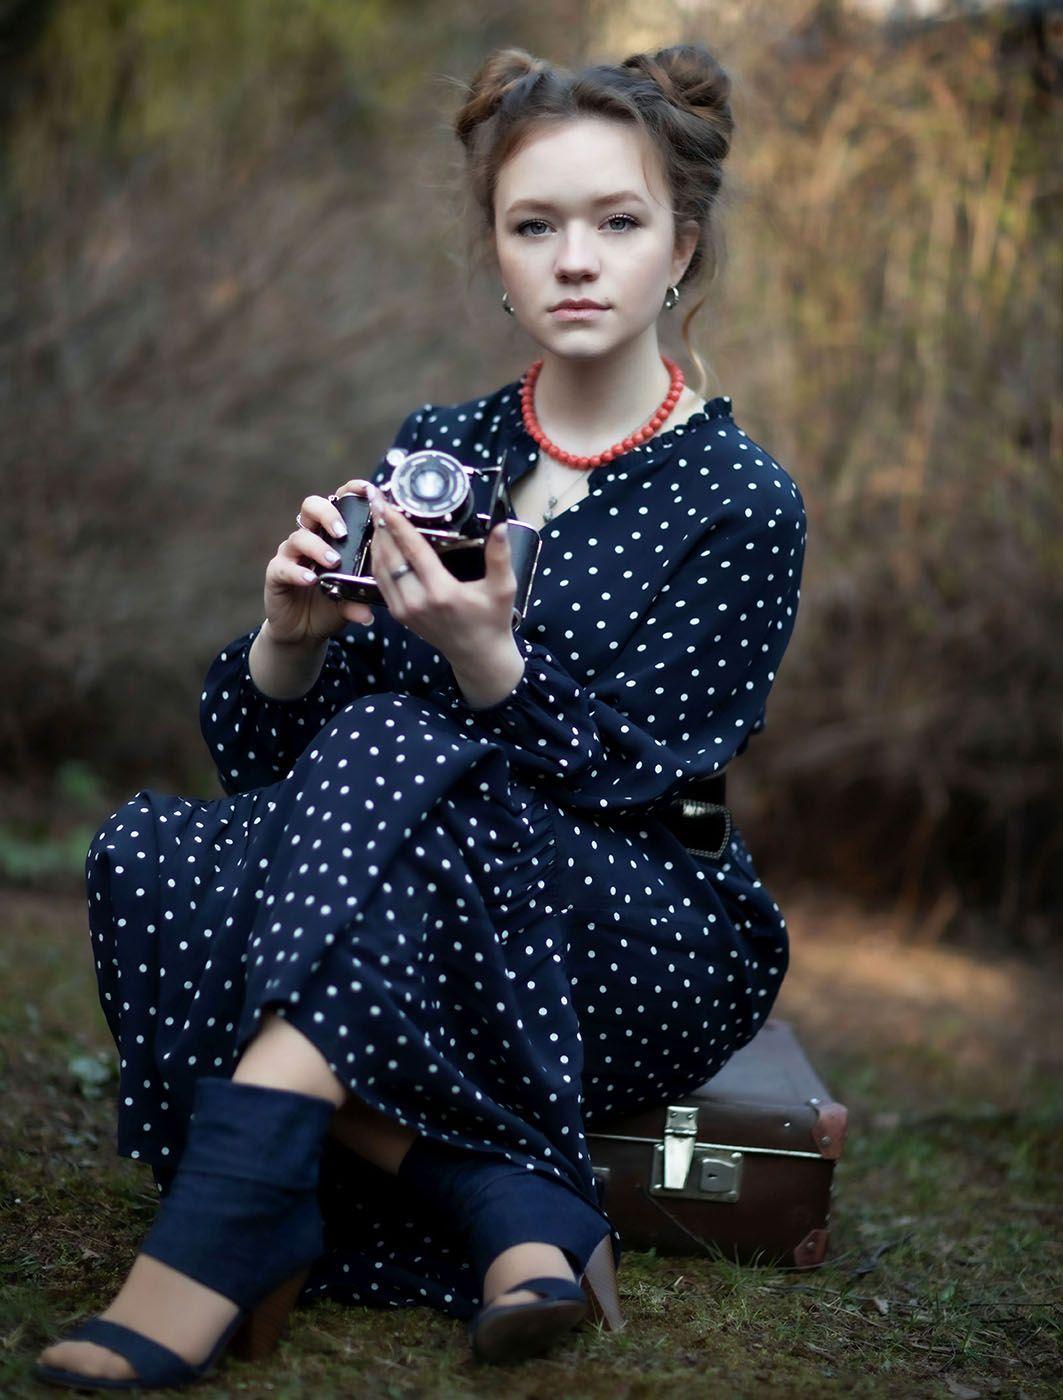 девушка, фотограф, ретро,стиль,фото, girl, photographer, retro, style,holiday, photos, Стукалова Юлия